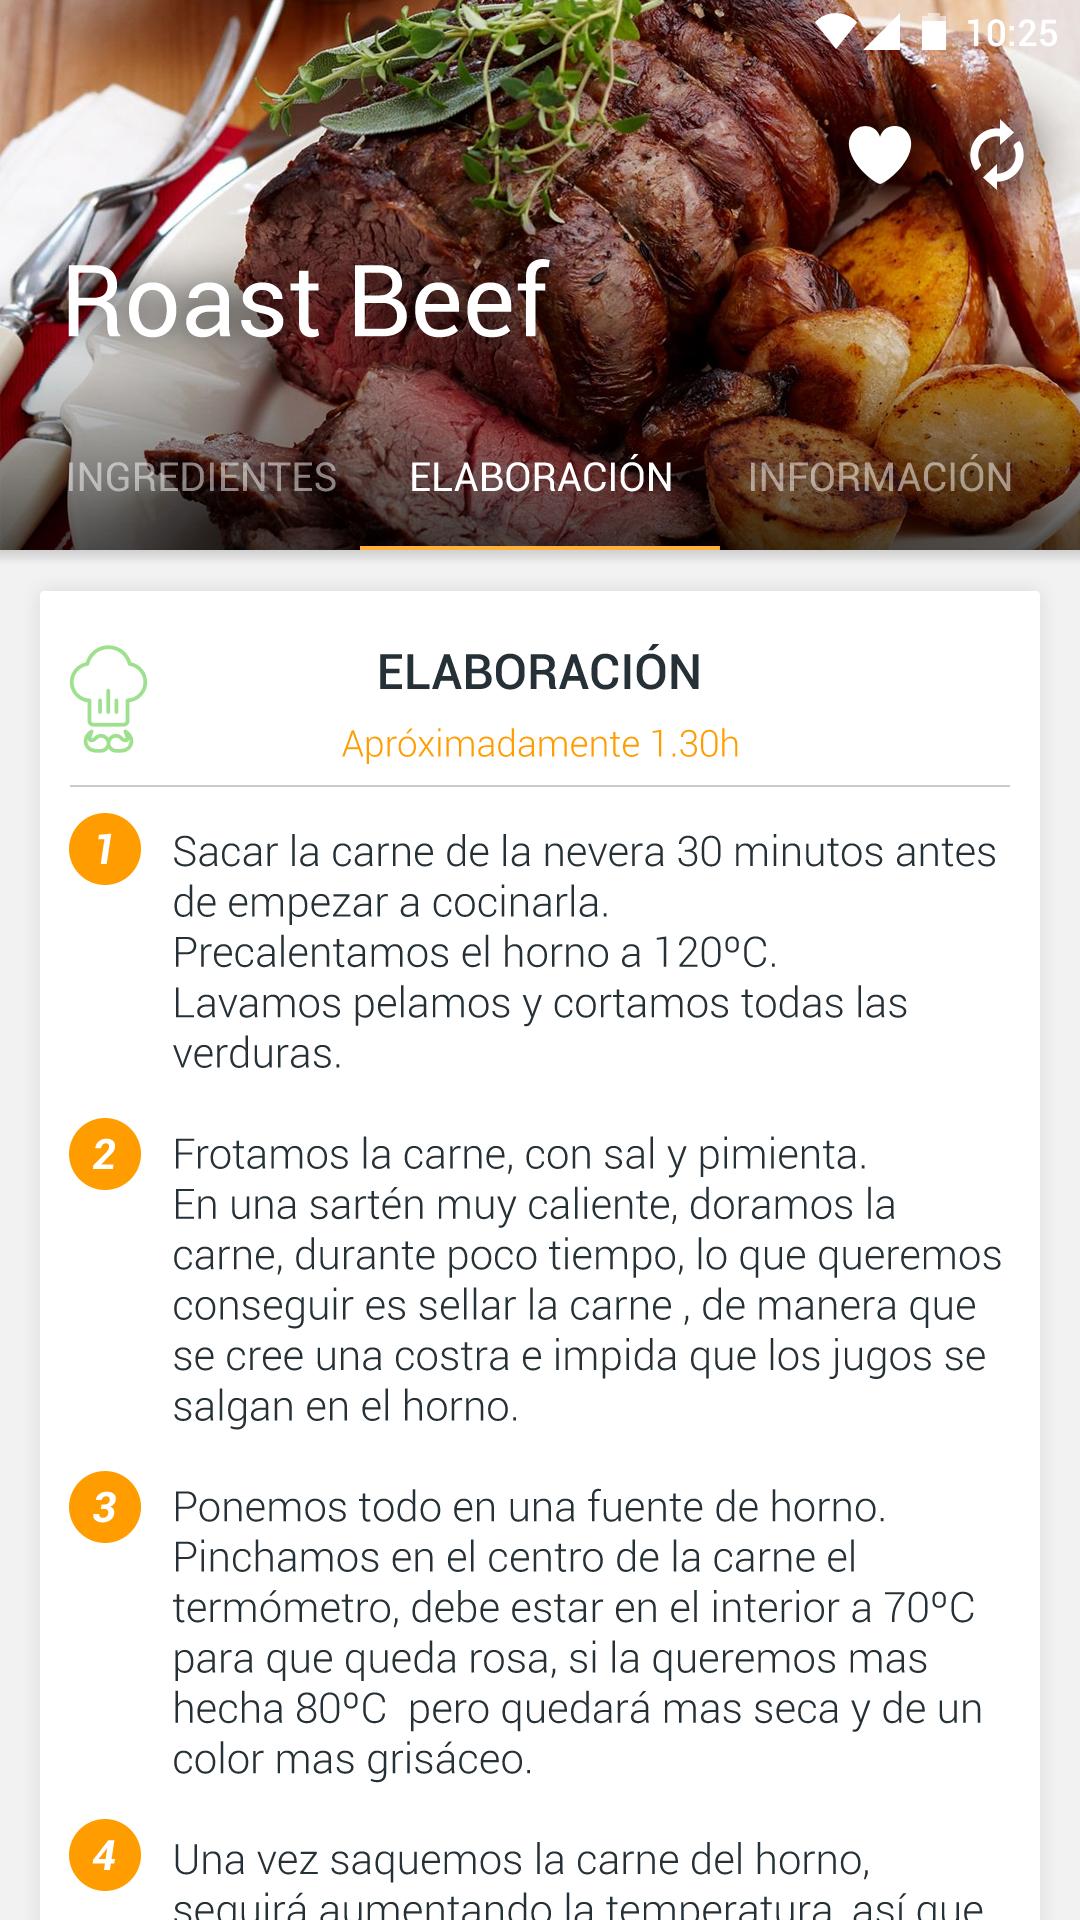 04_RECETA_ELABORACION.png